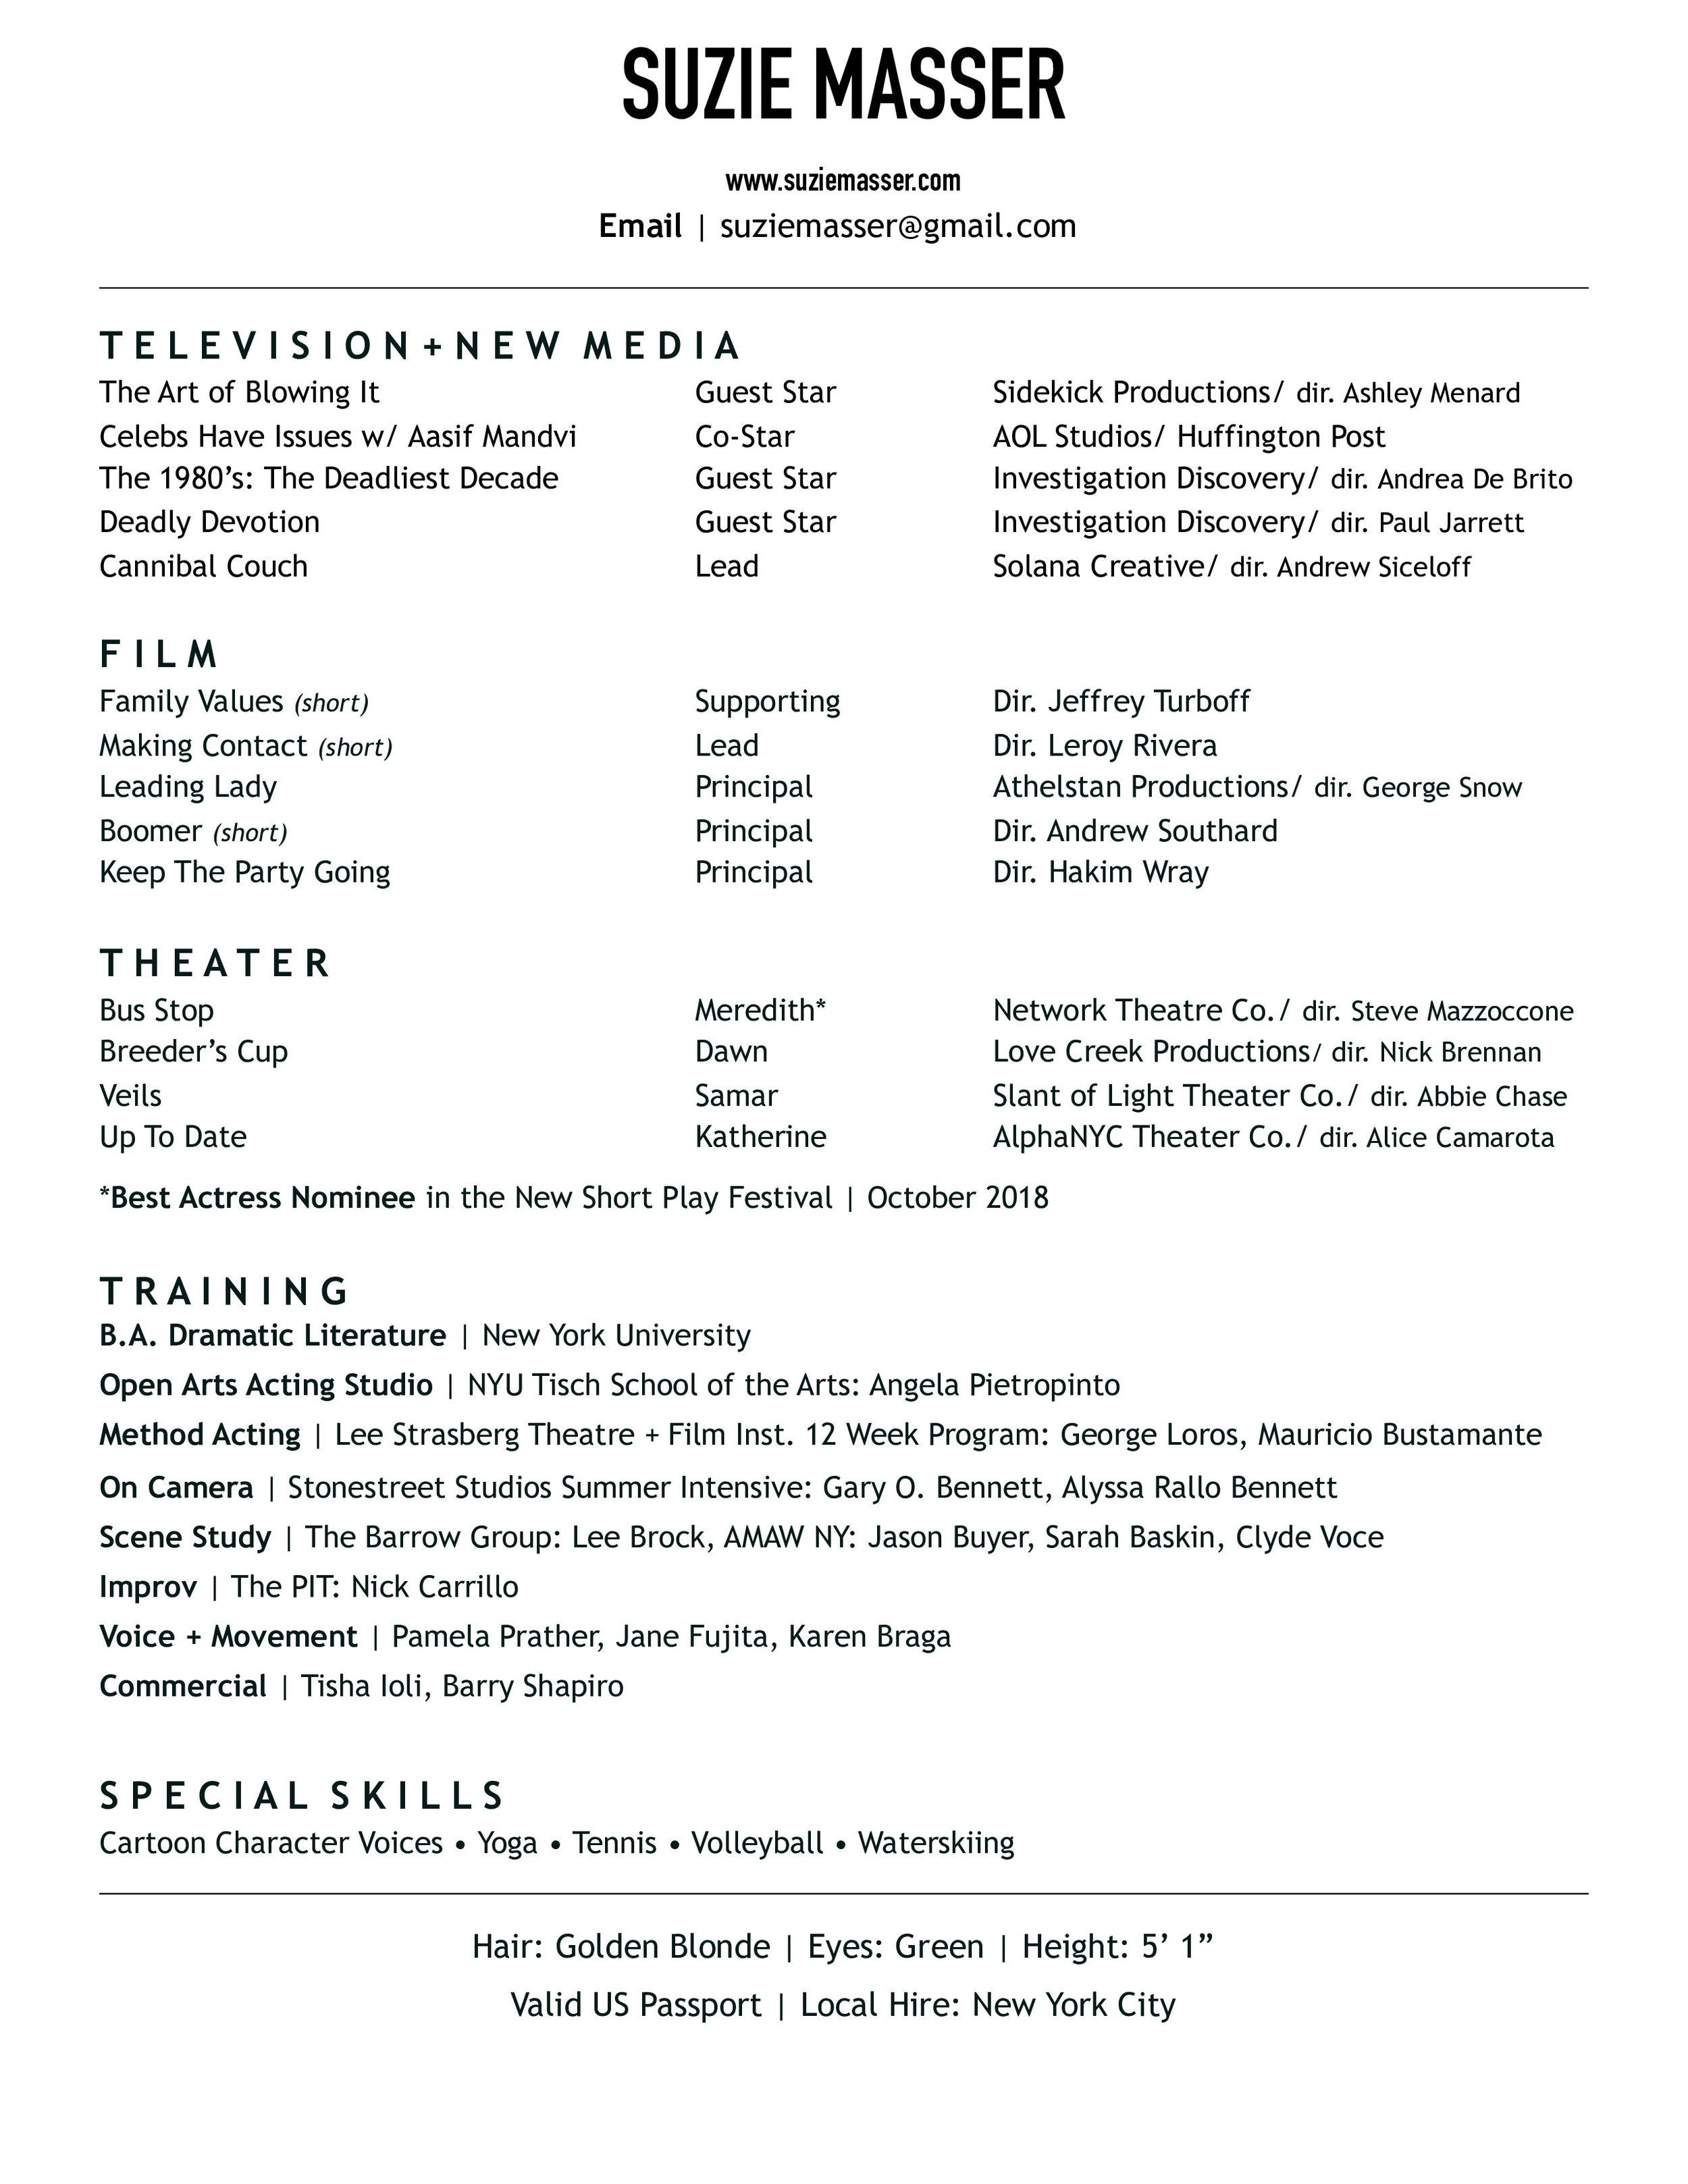 suzie masser resume __jpeg.jpg